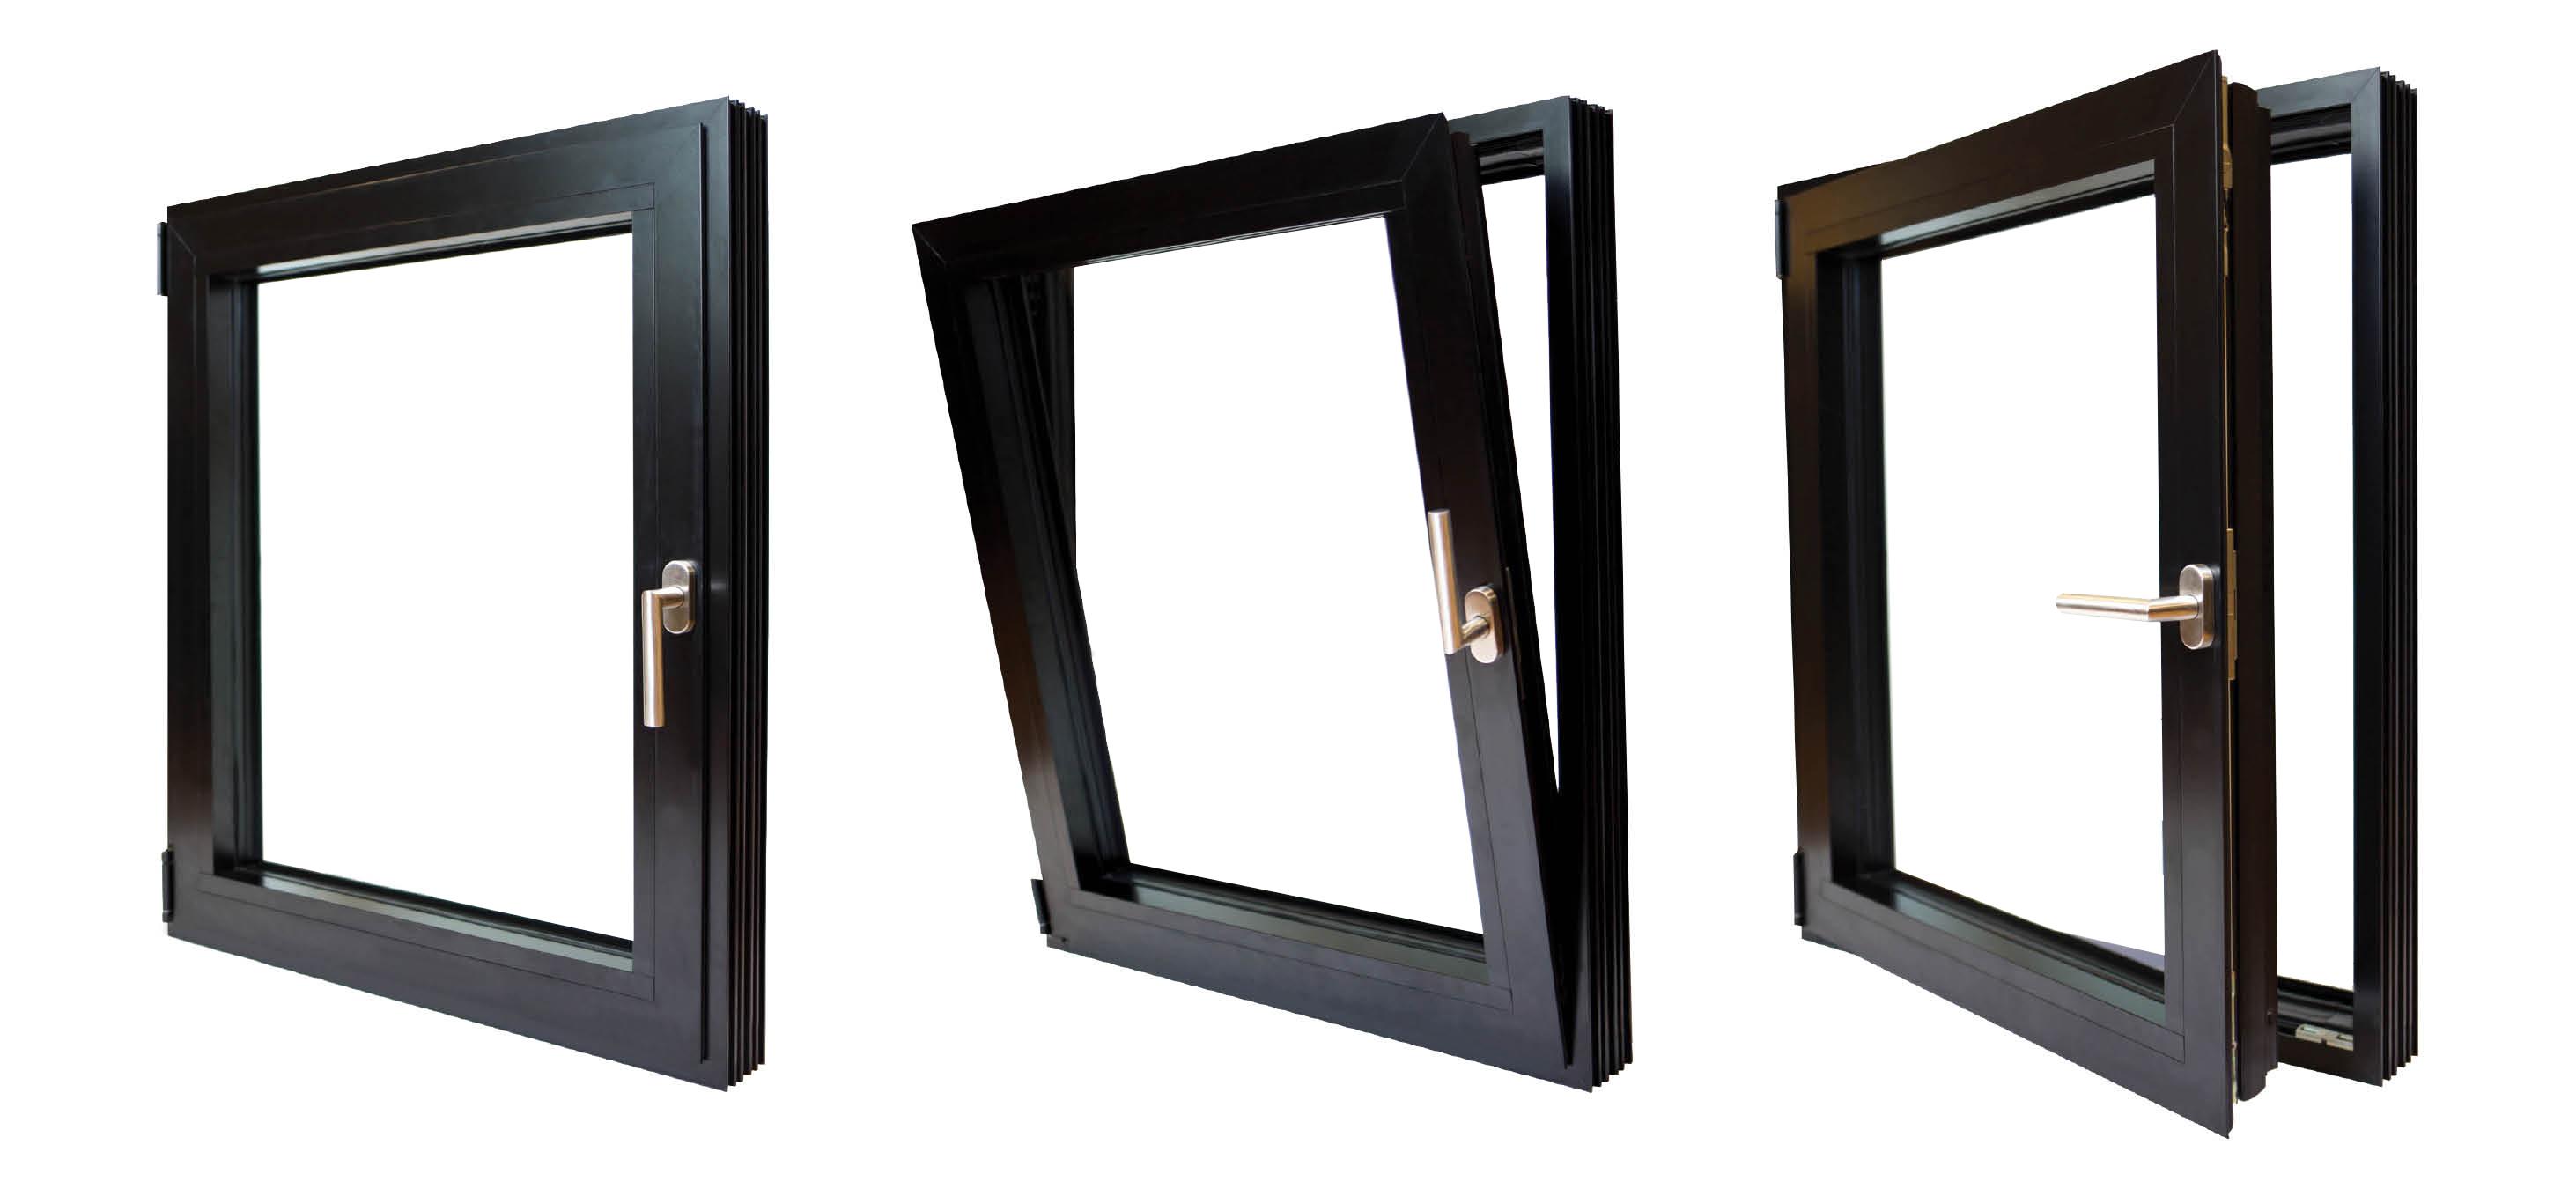 3 tilt turn windows aluminum 1